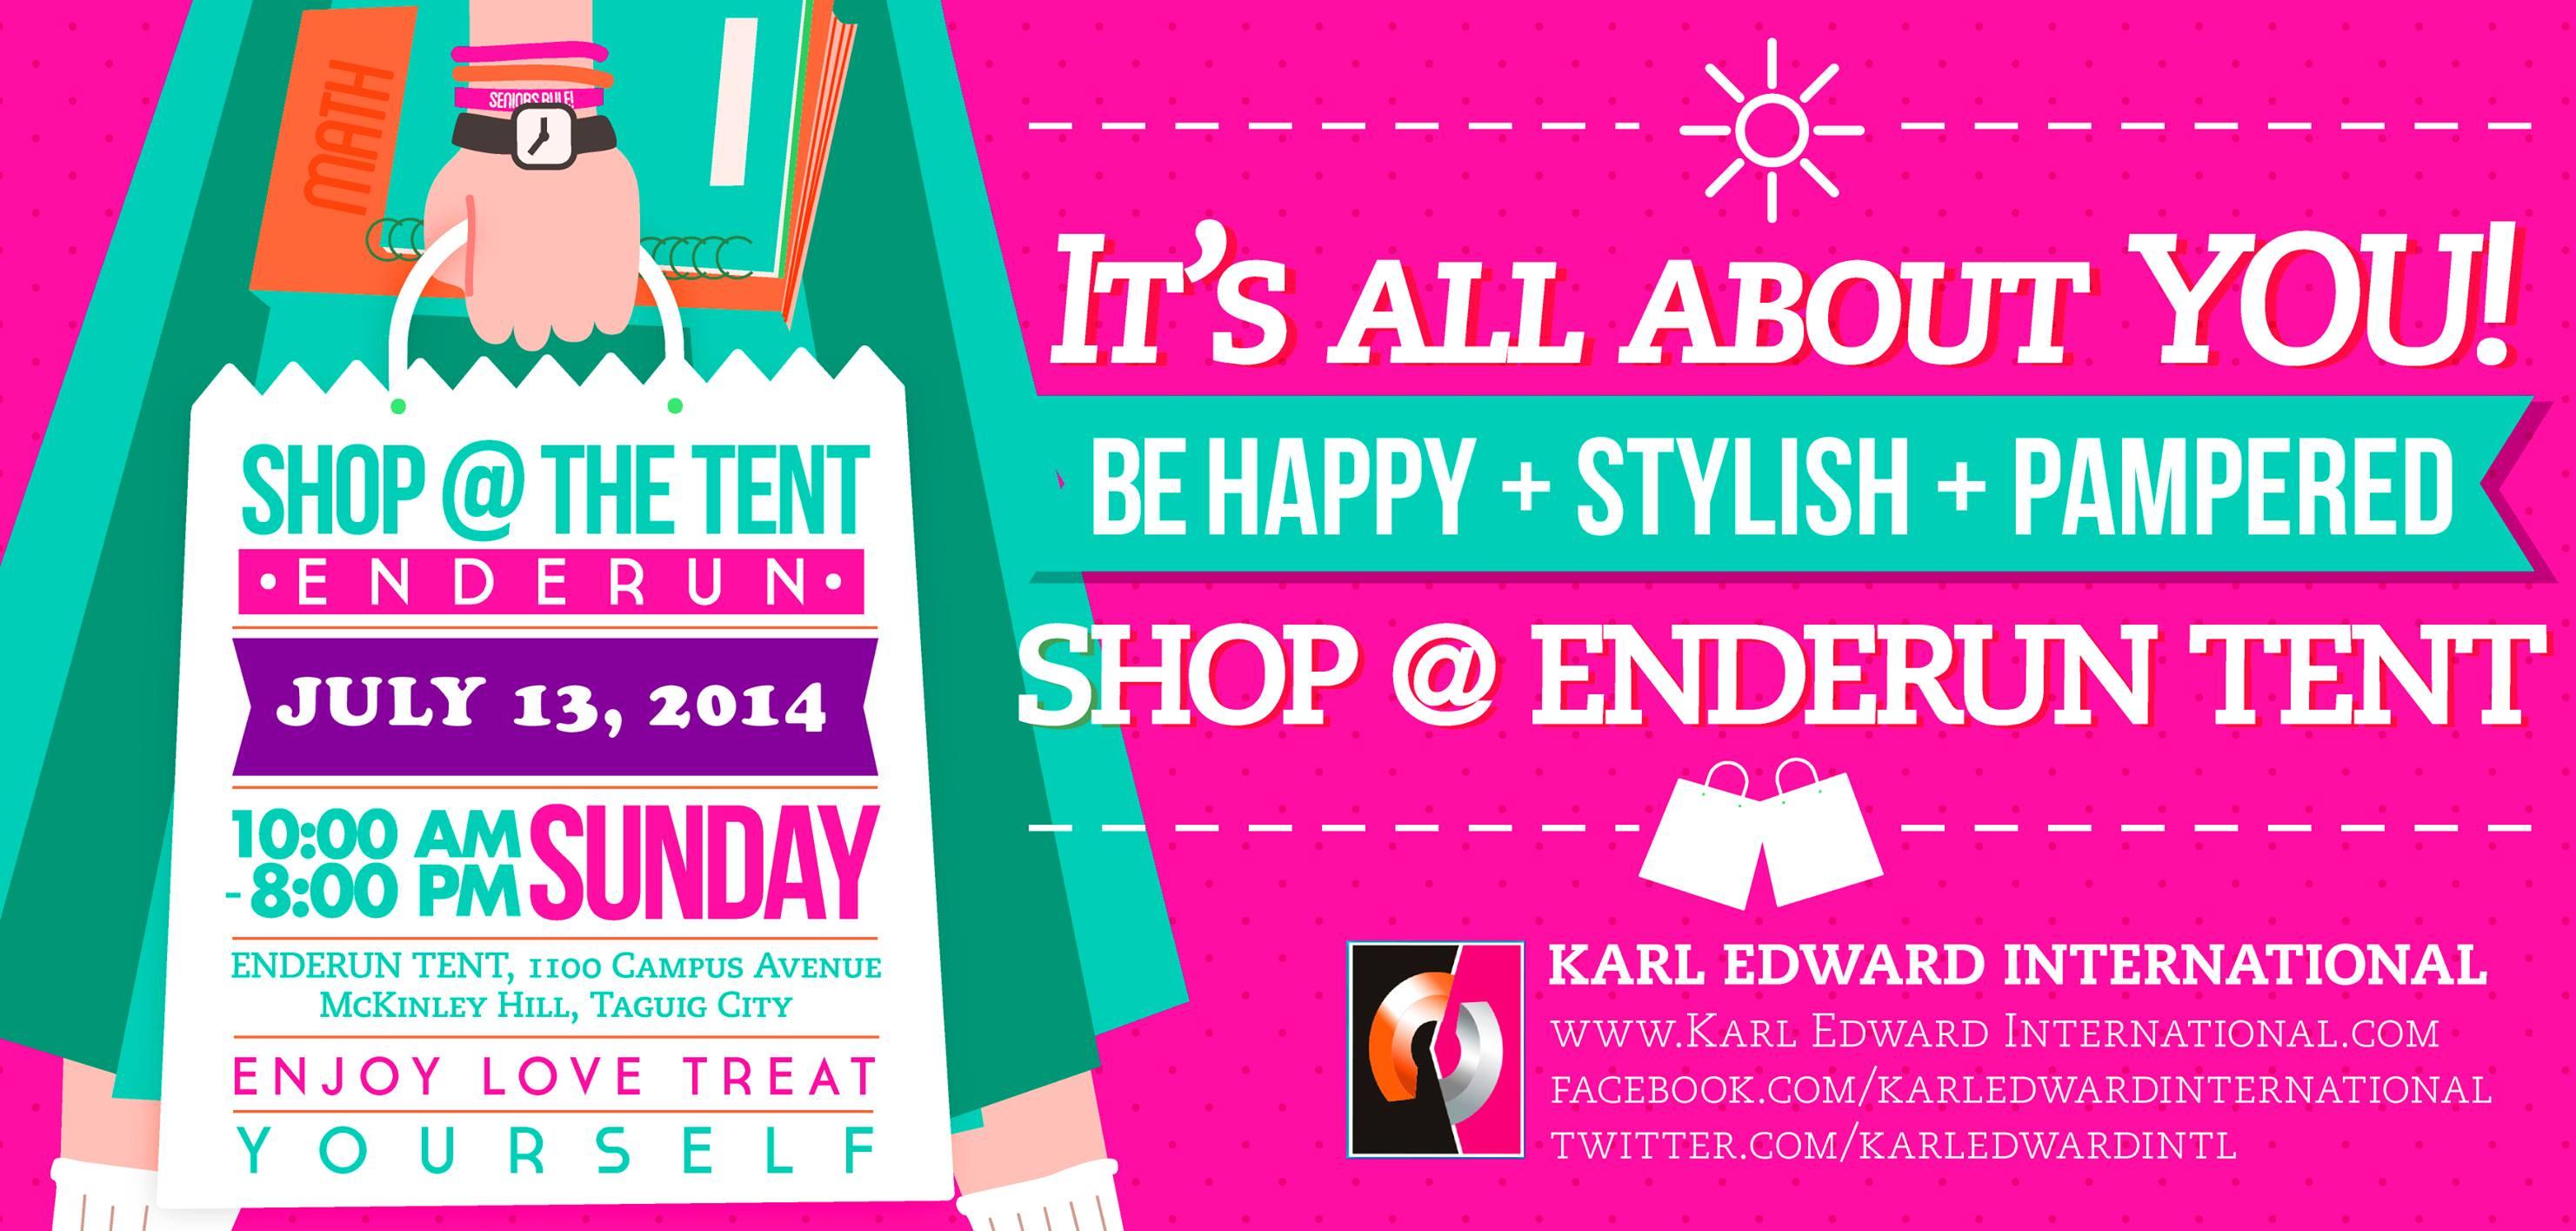 Shop @ Enderun Tent July 2014